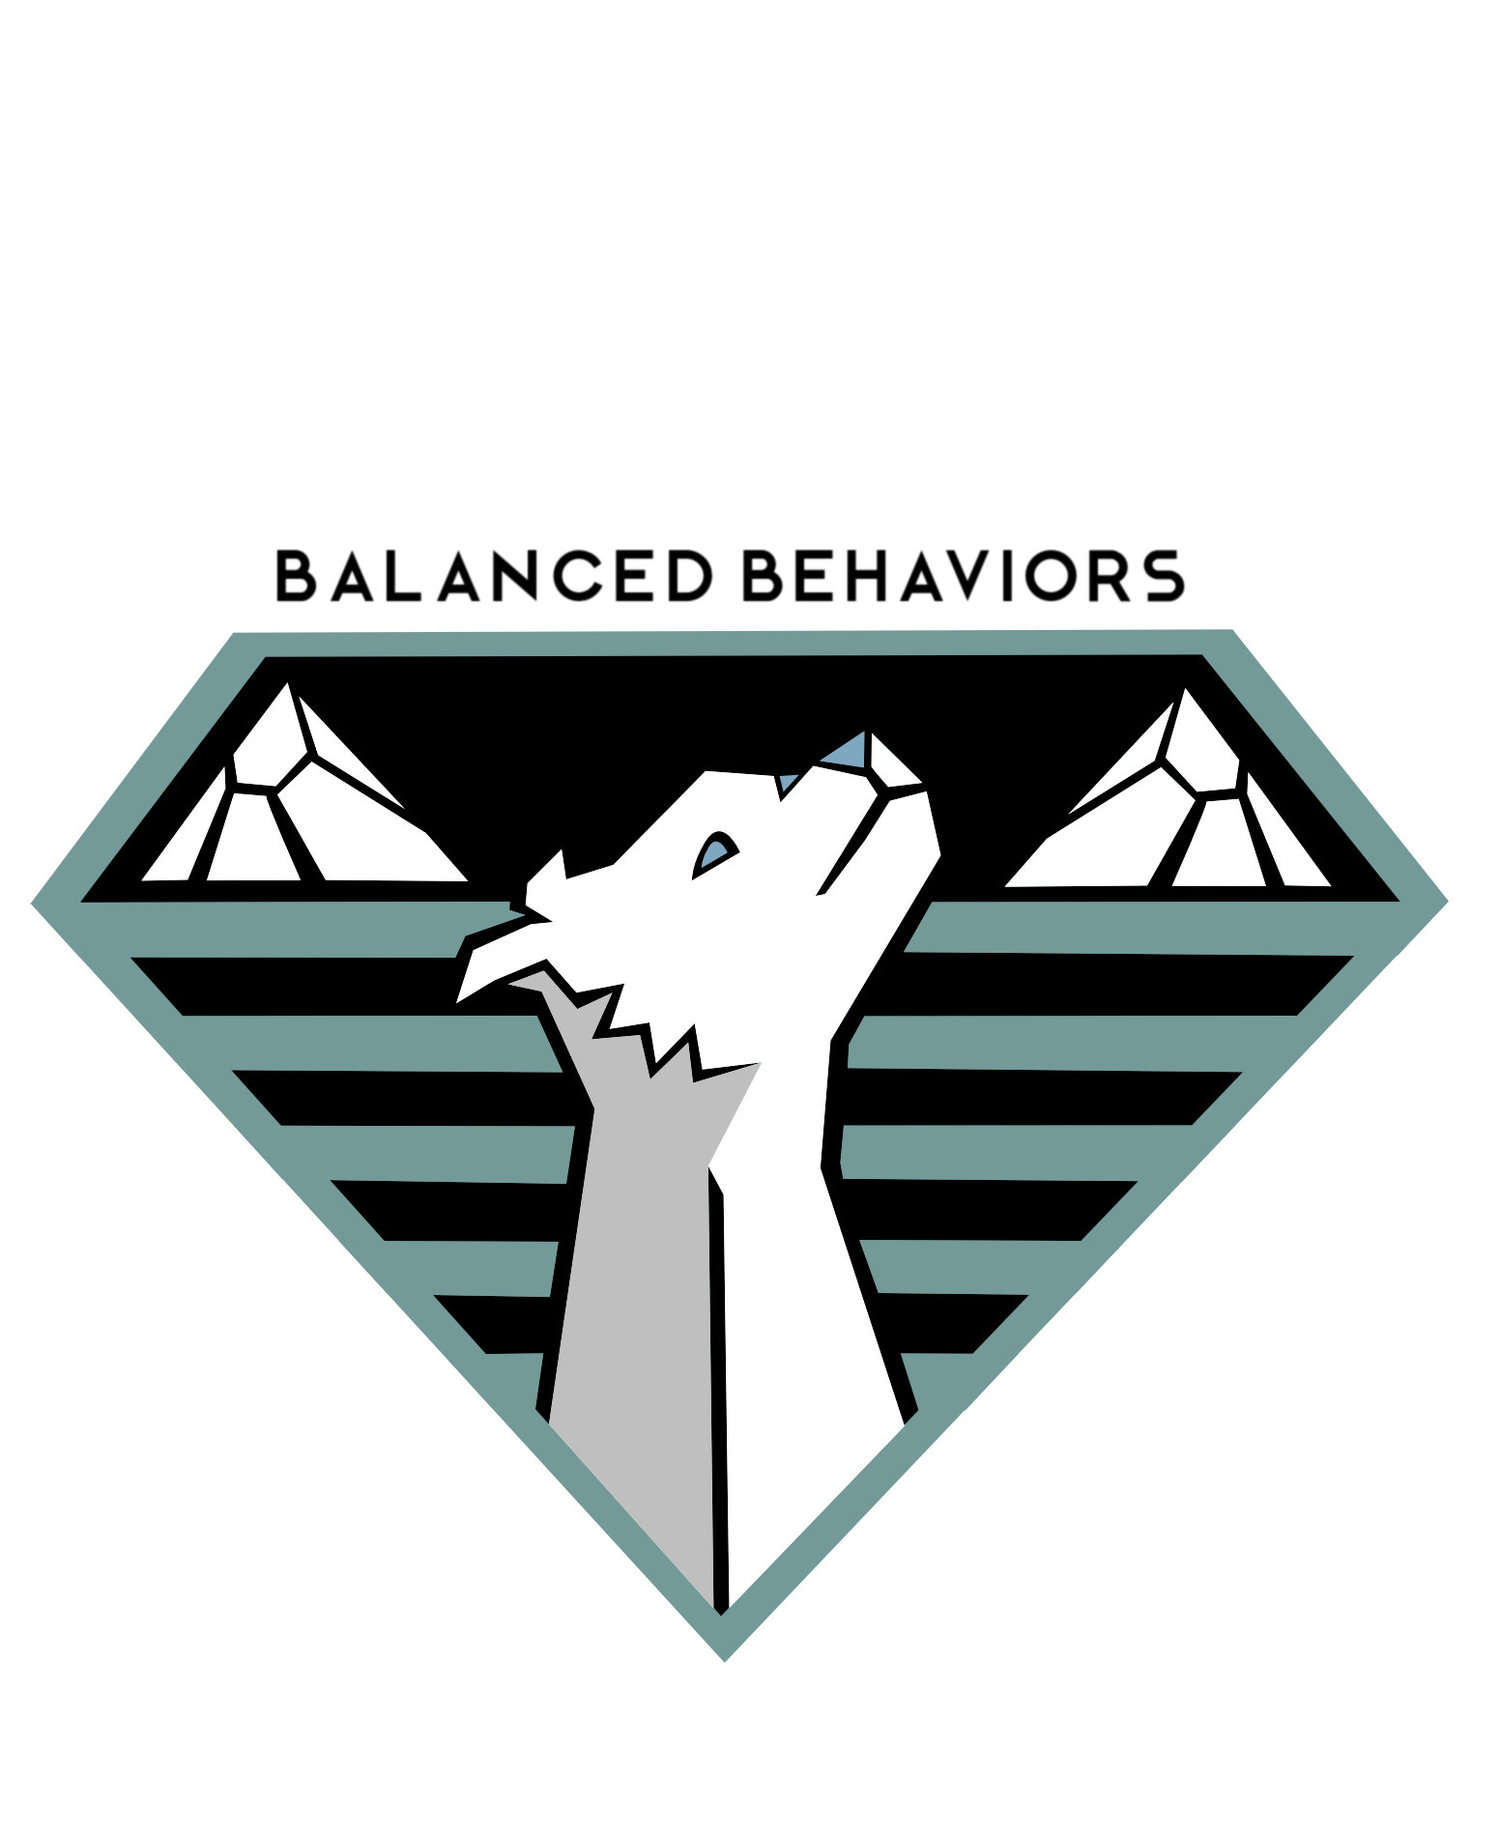 Balanced Behaviors